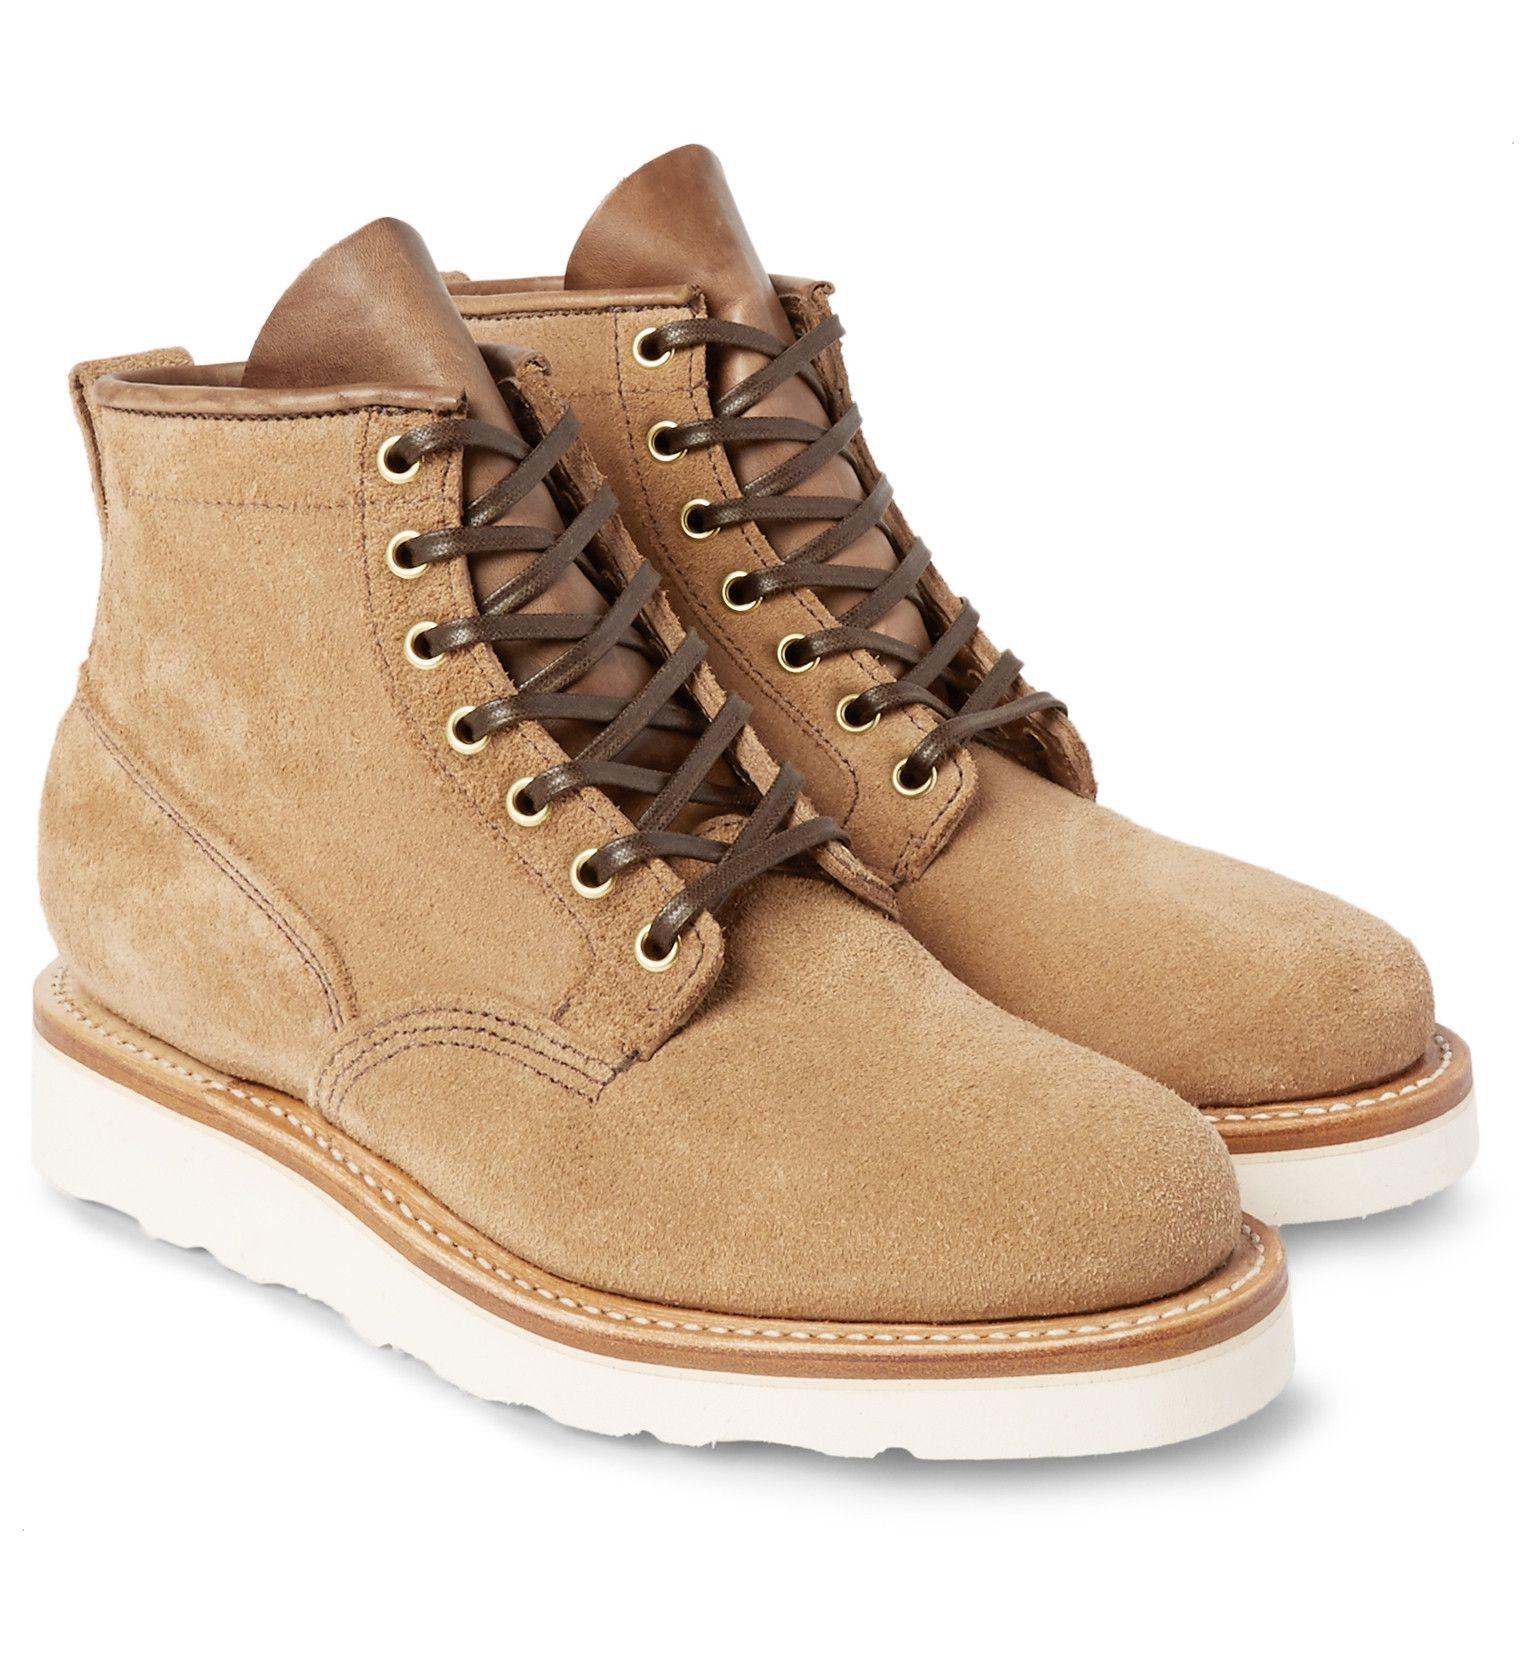 Men's Designer Boots